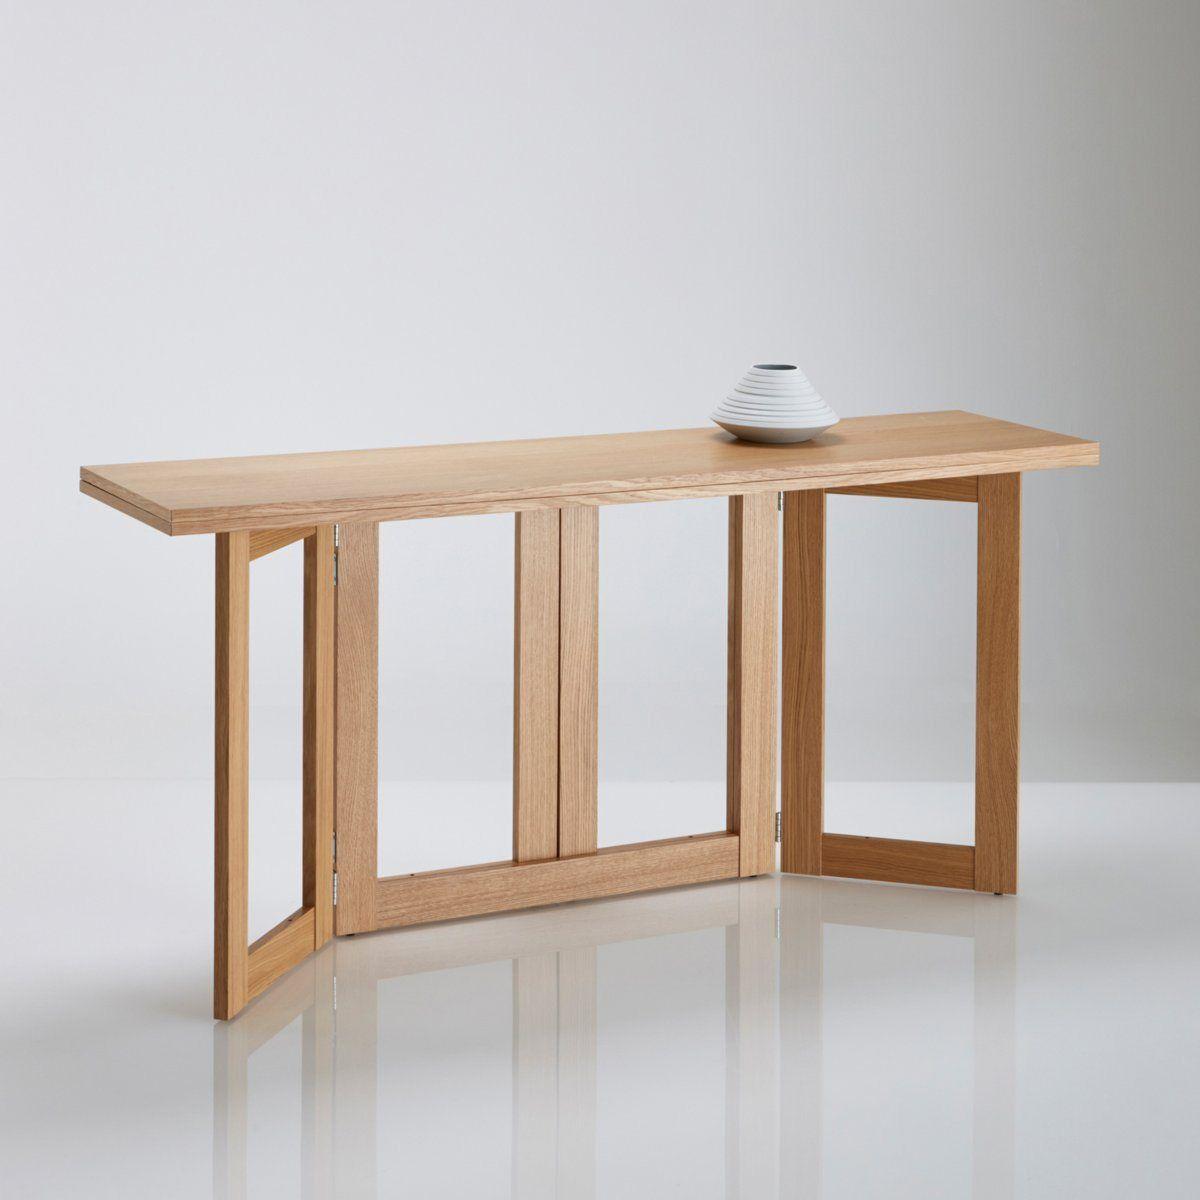 Table Console Personnes Dimensions De La Table Console